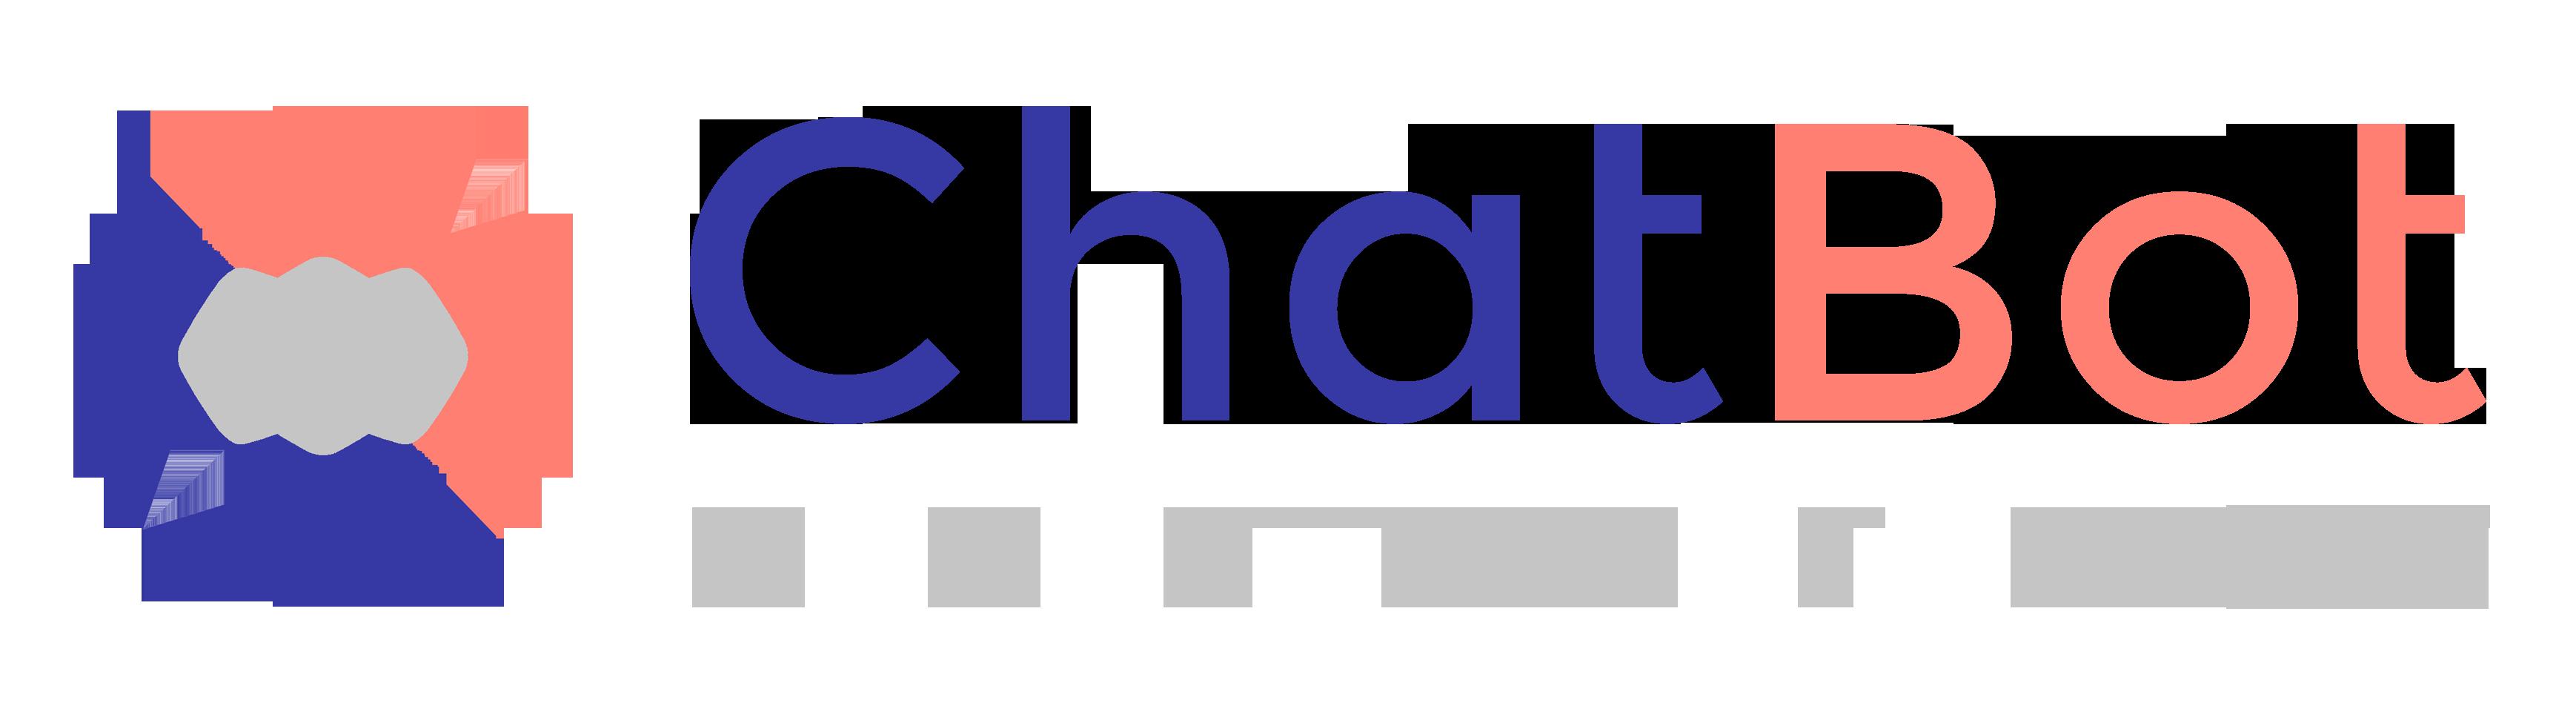 ChatbotMarketing, a chatbot developer